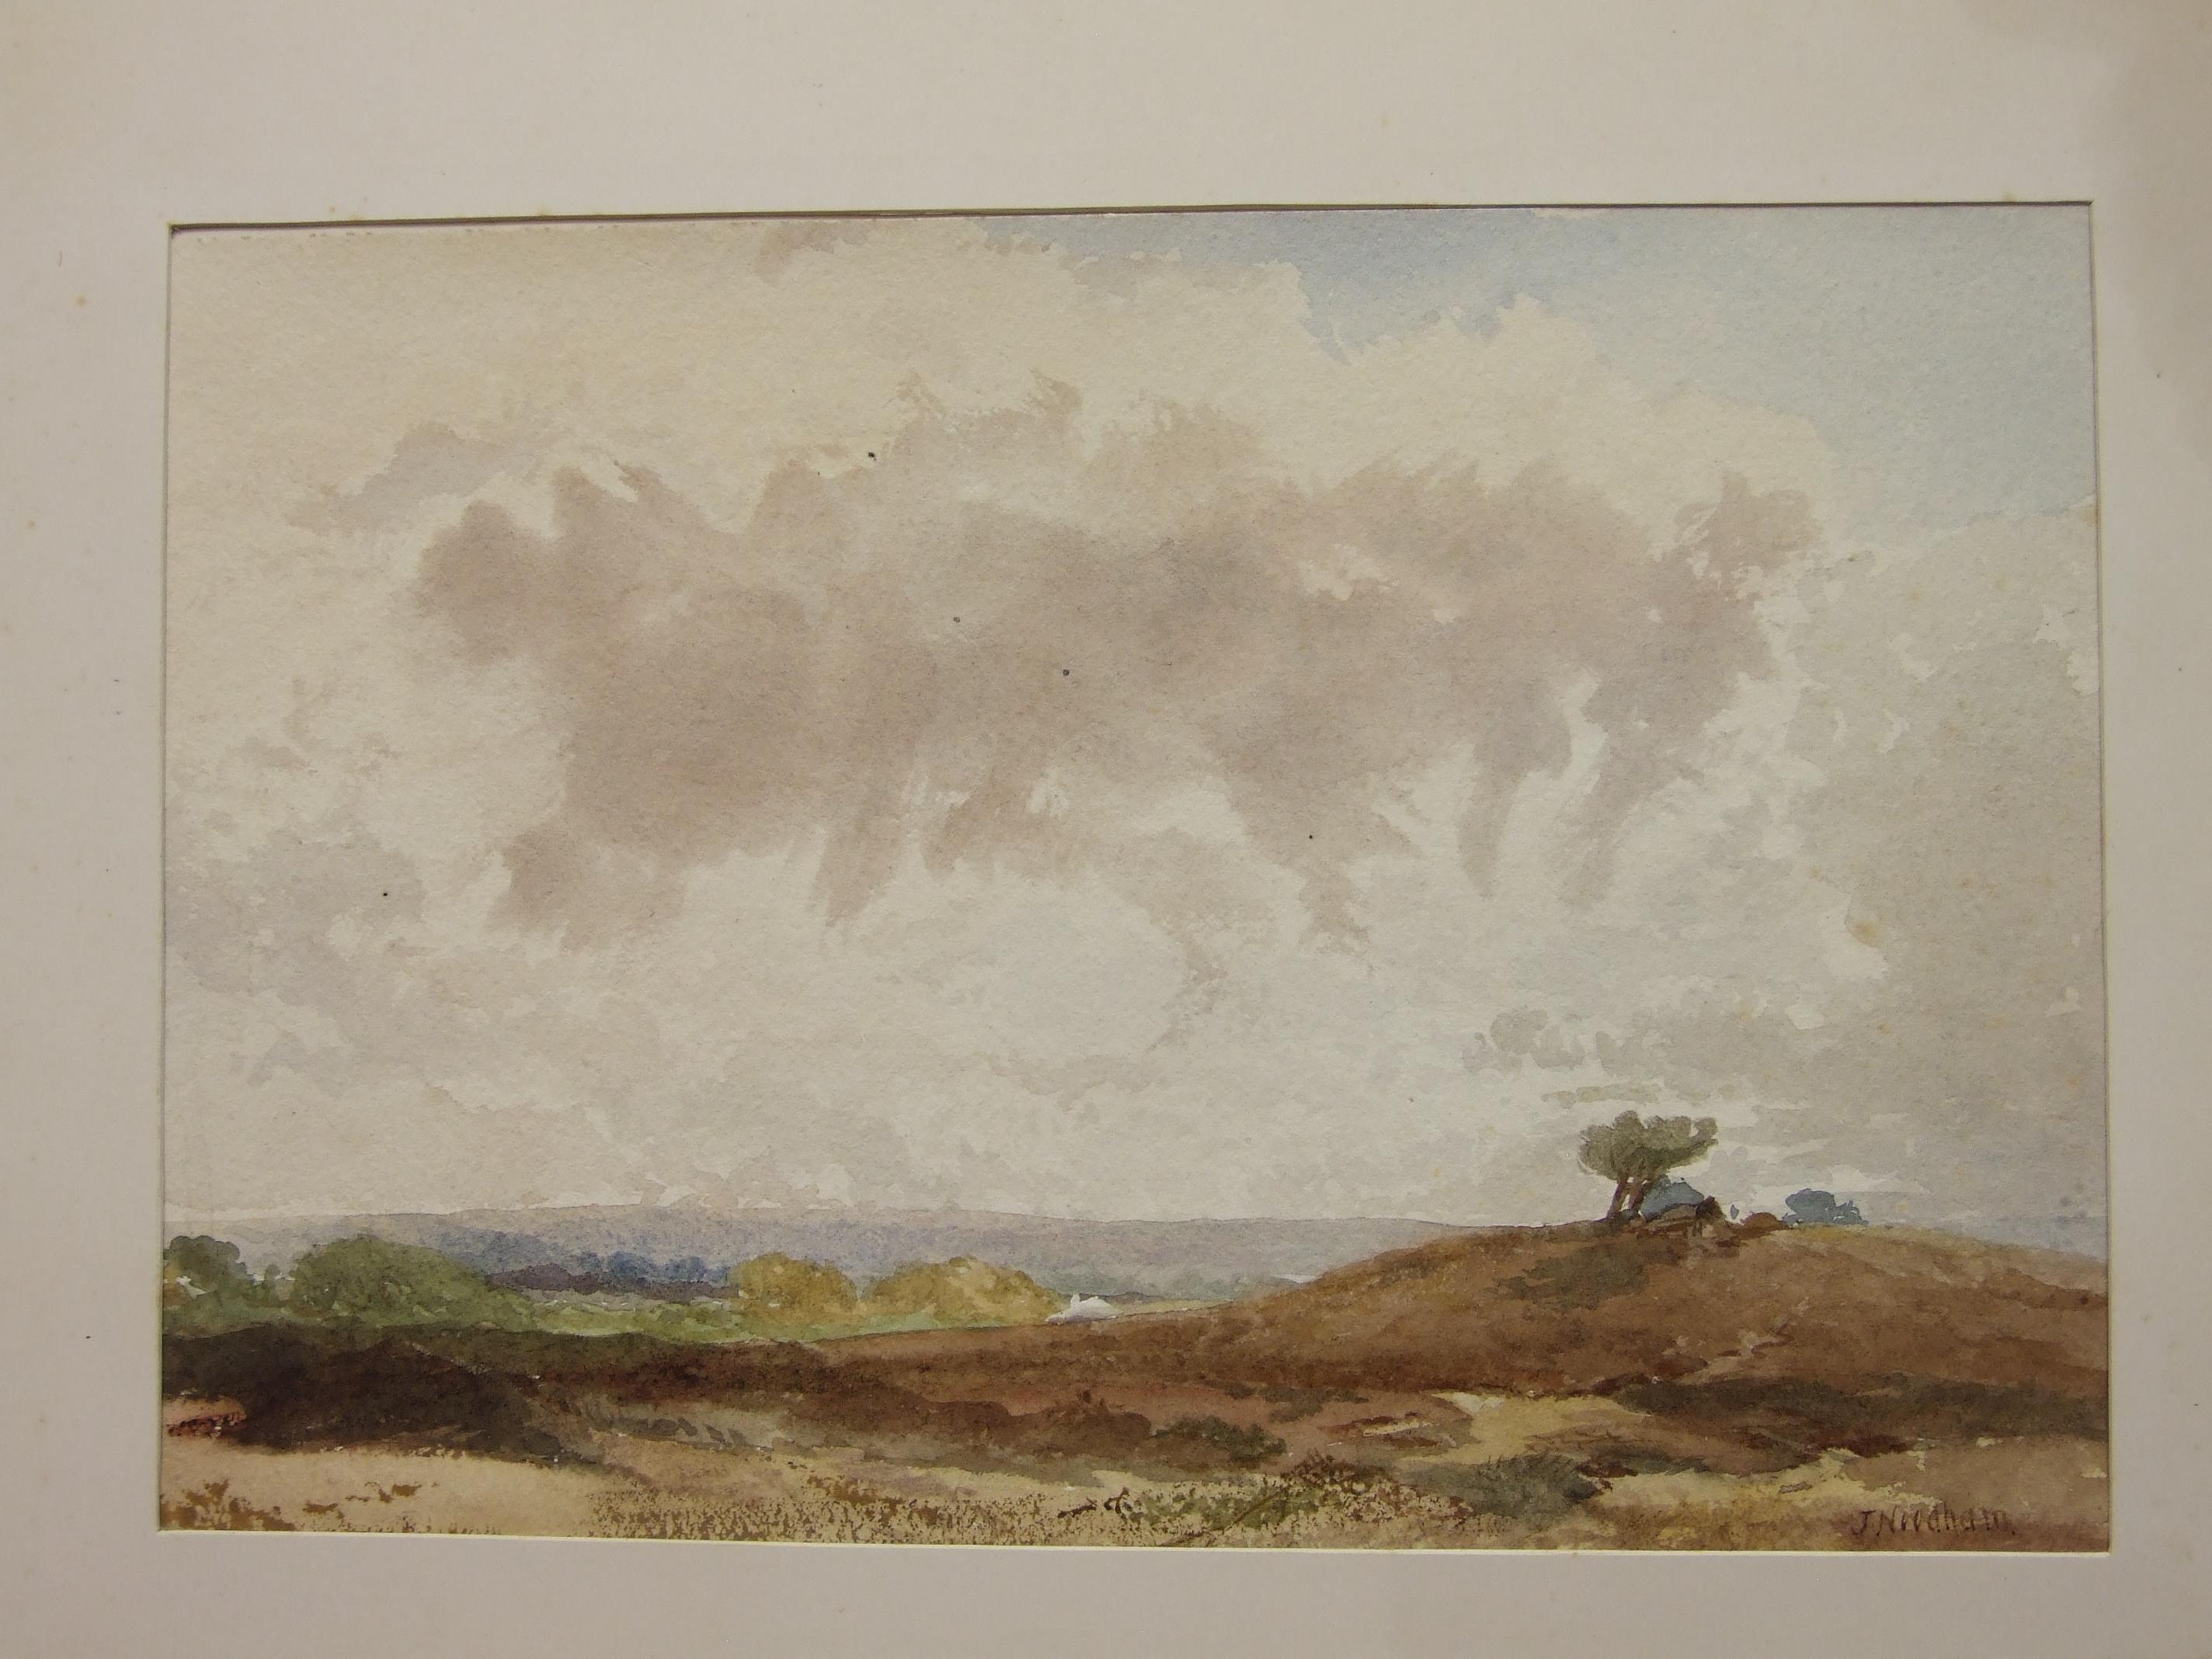 Lot 13 - Joseph Needham (c1810-1880), an album containing twelve signed watercolours, mainly mountainous